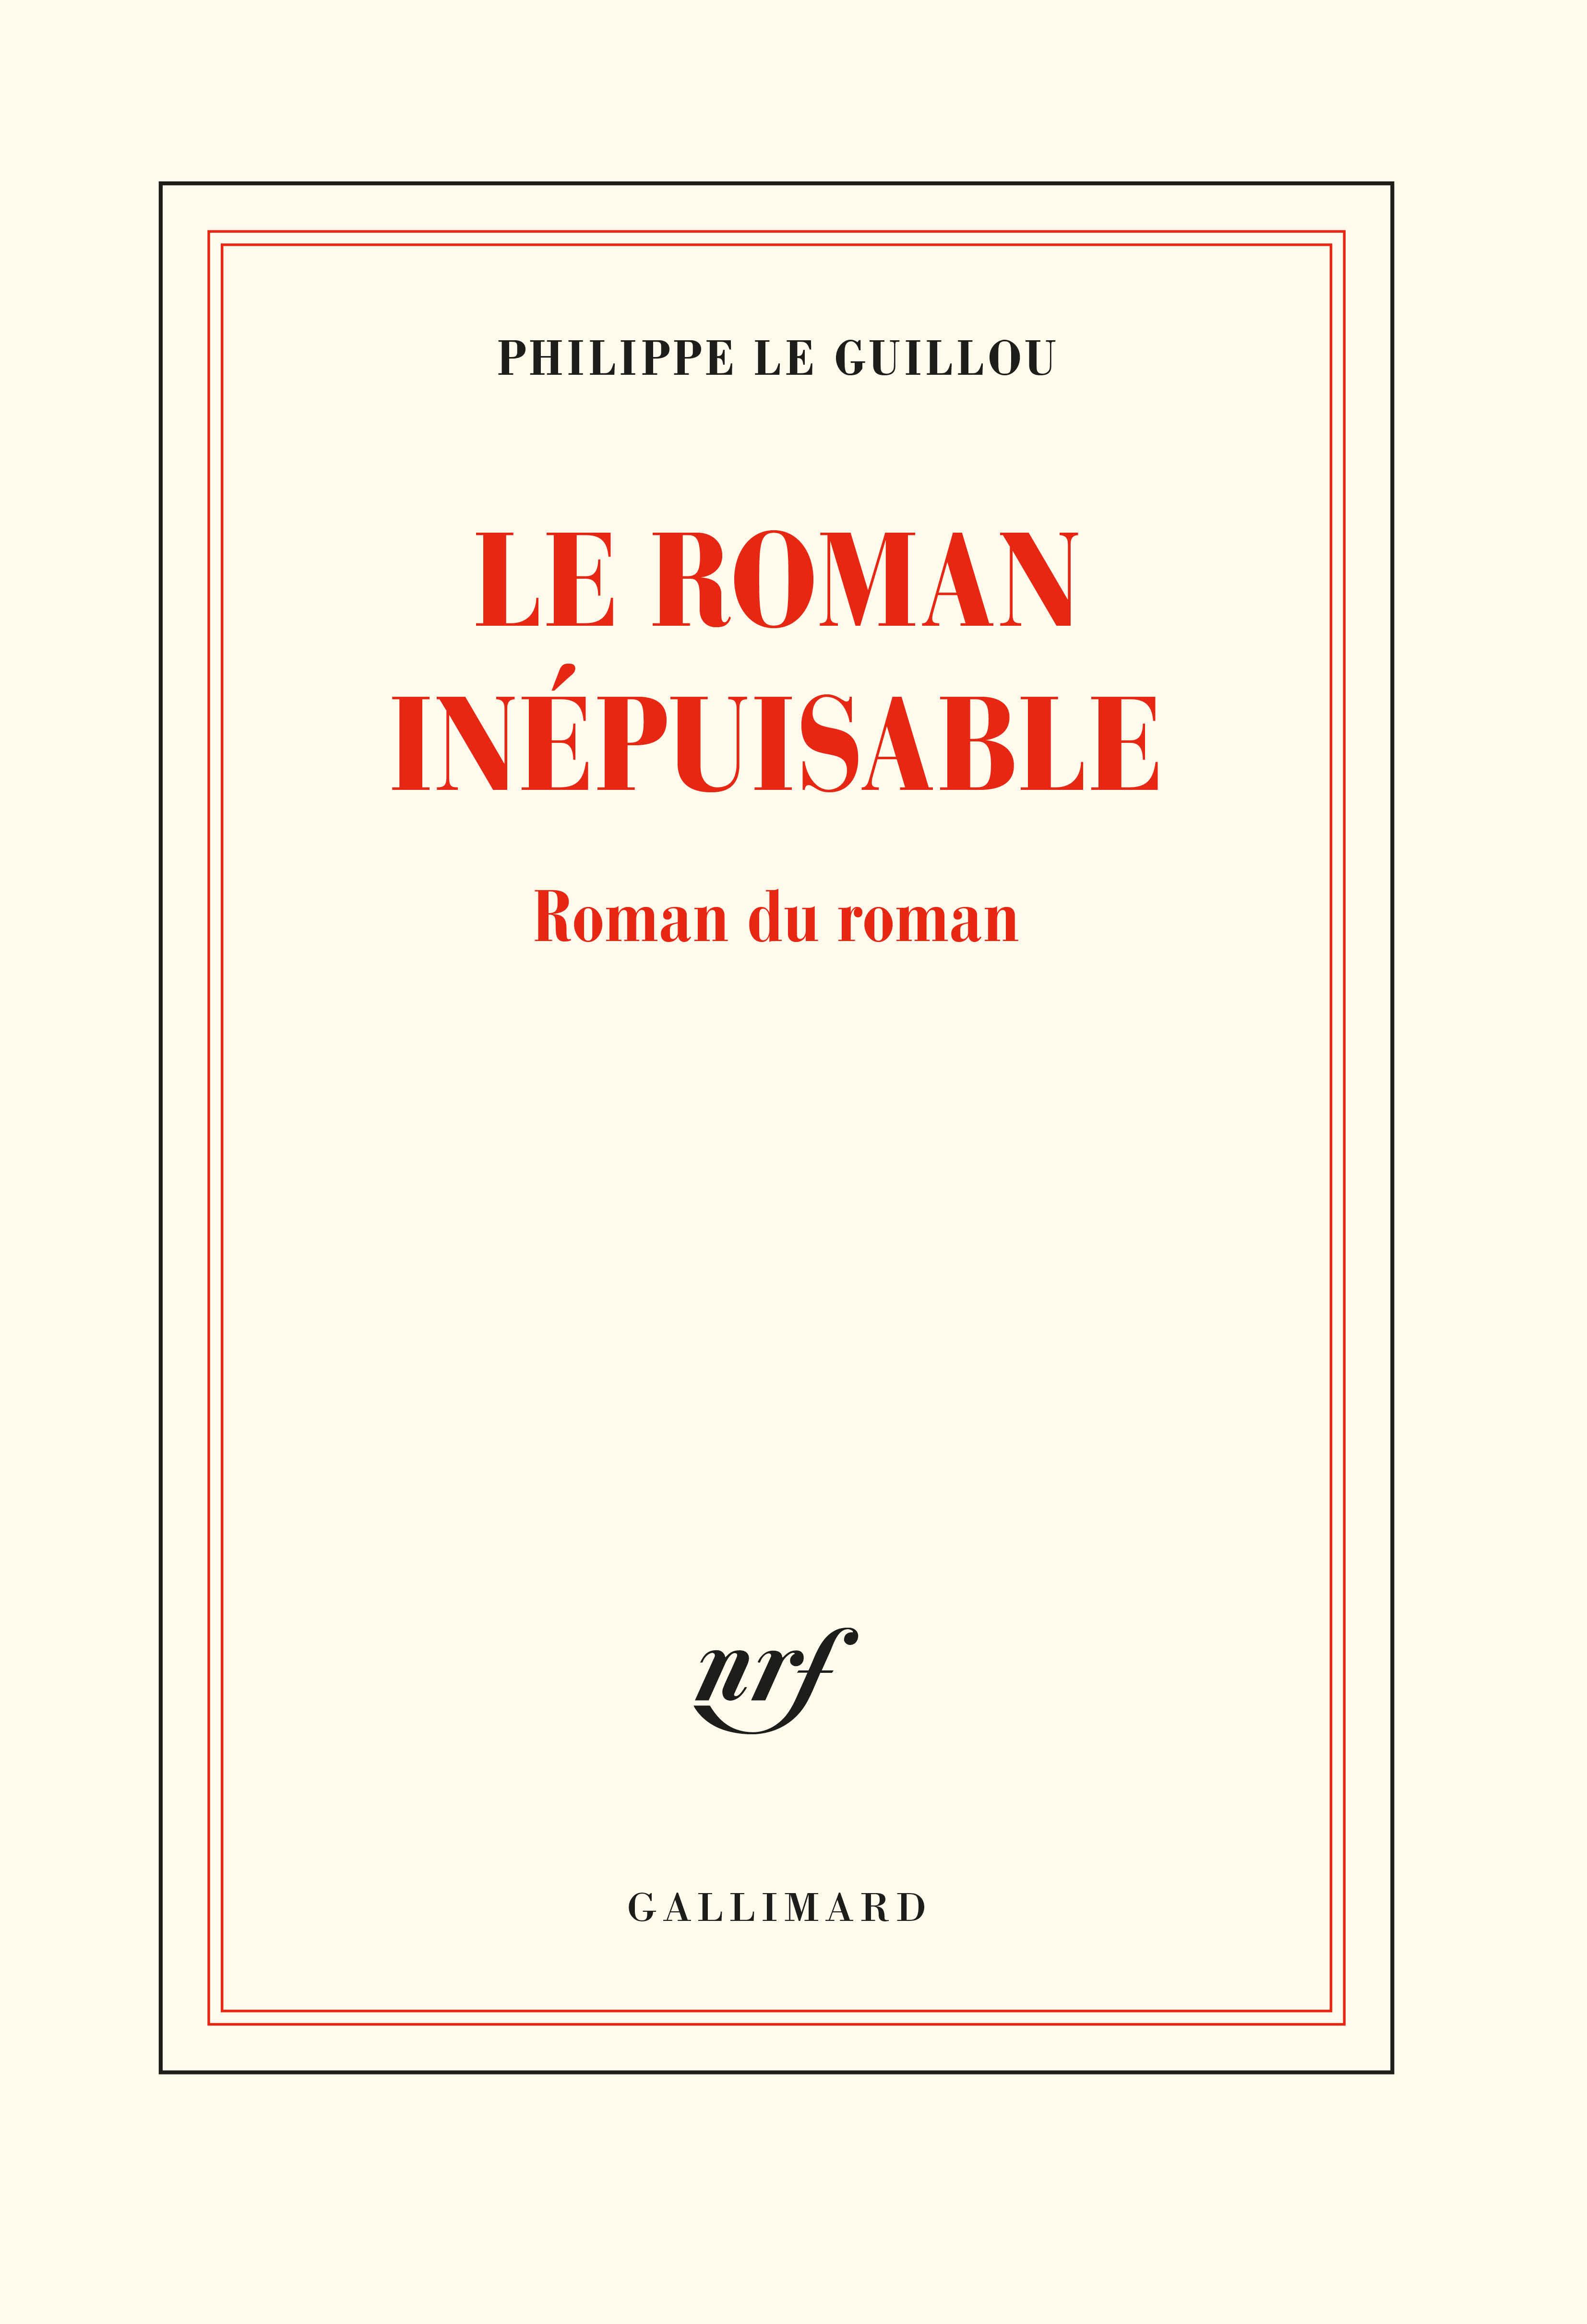 LE ROMAN INEPUISABLE - ROMAN DU ROMAN